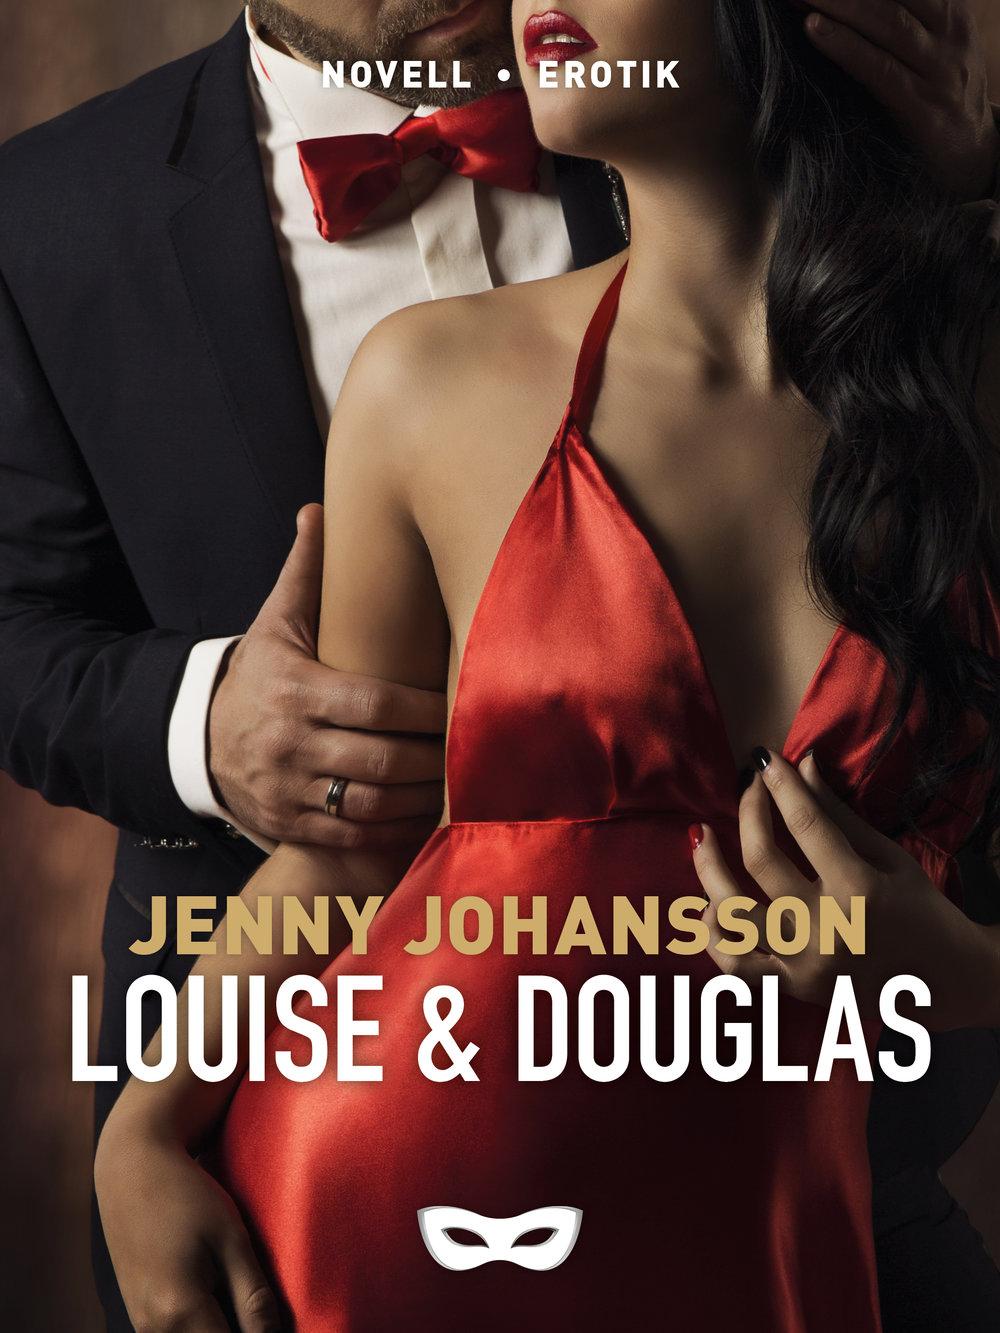 LOUISE-n_Louise & Douglas_Jenny Johansson.jpg